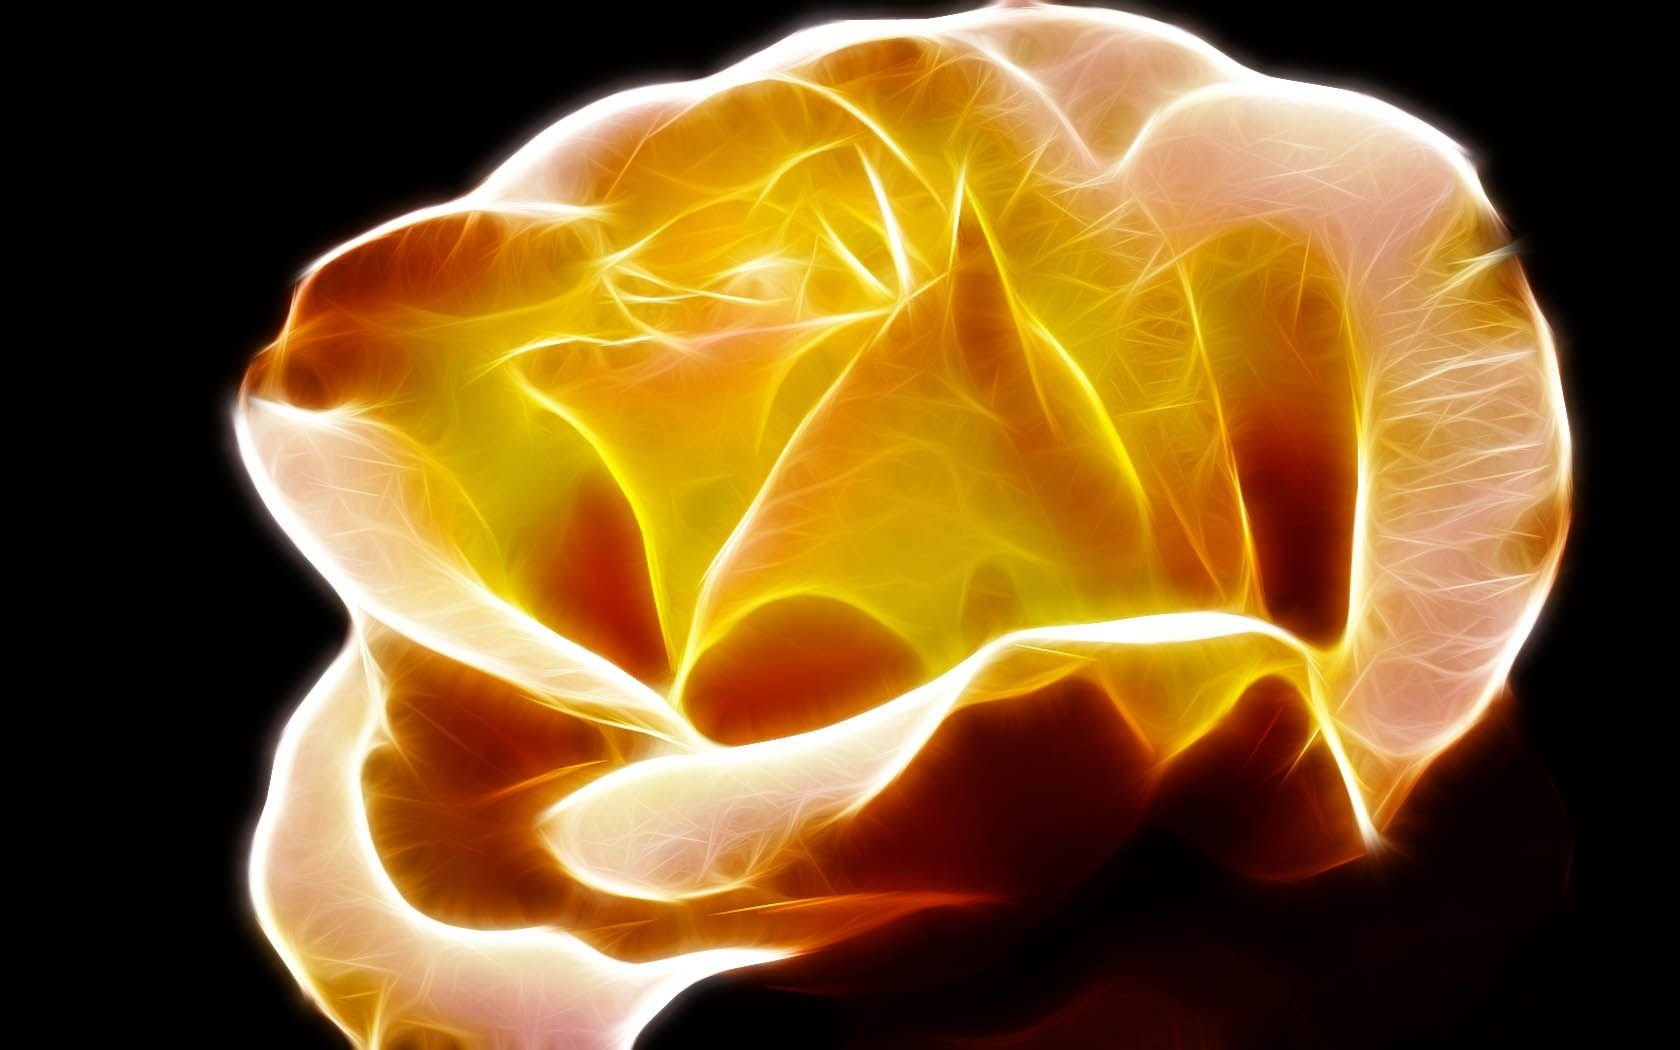 Artistic - Flower  Cute Fractal Yellow Petal Rose Orange Red Wallpaper